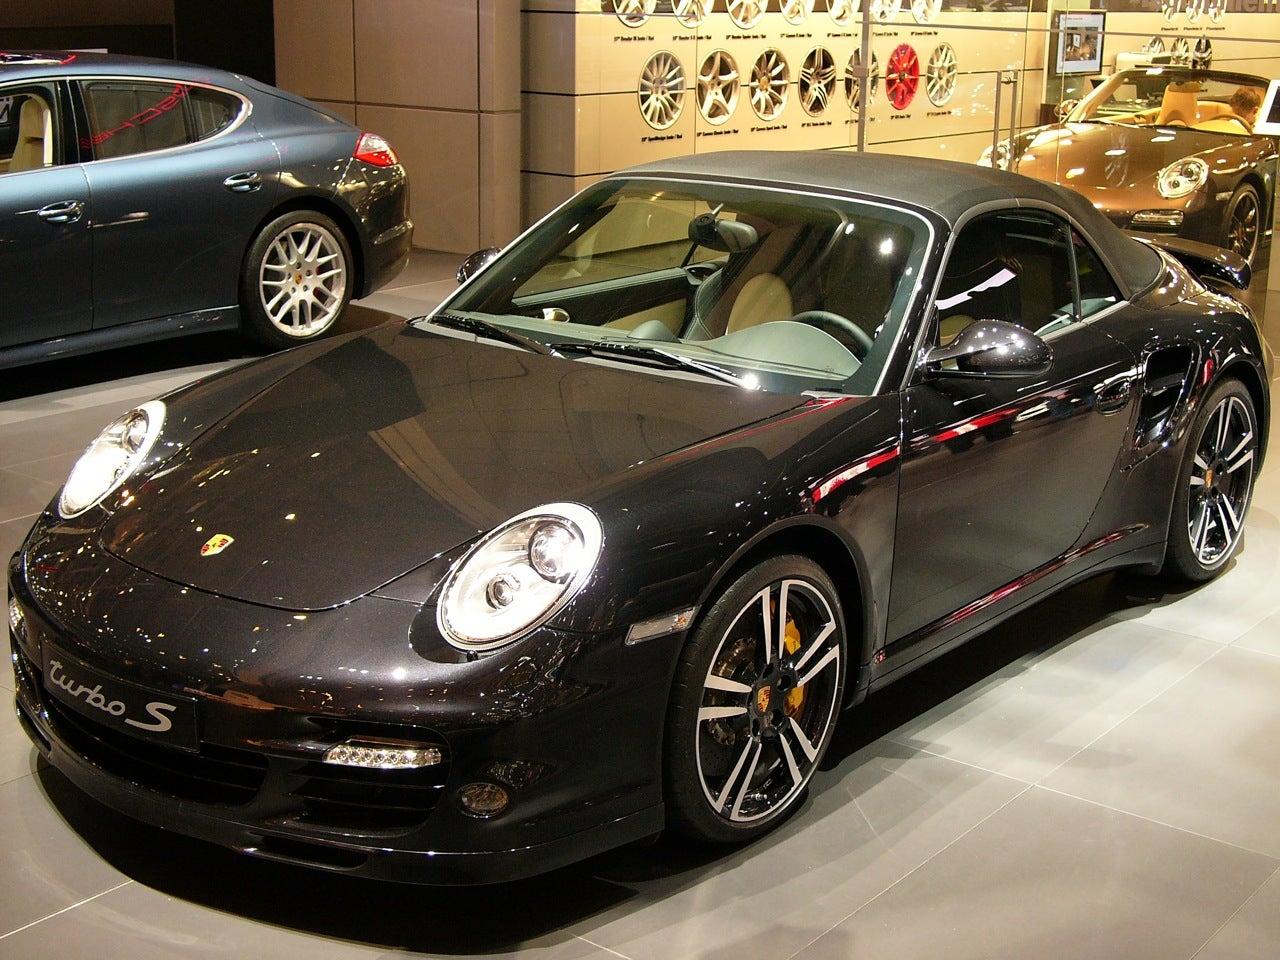 2011 porsche 911 turbo s cabriolet bald spot not pictured. Black Bedroom Furniture Sets. Home Design Ideas